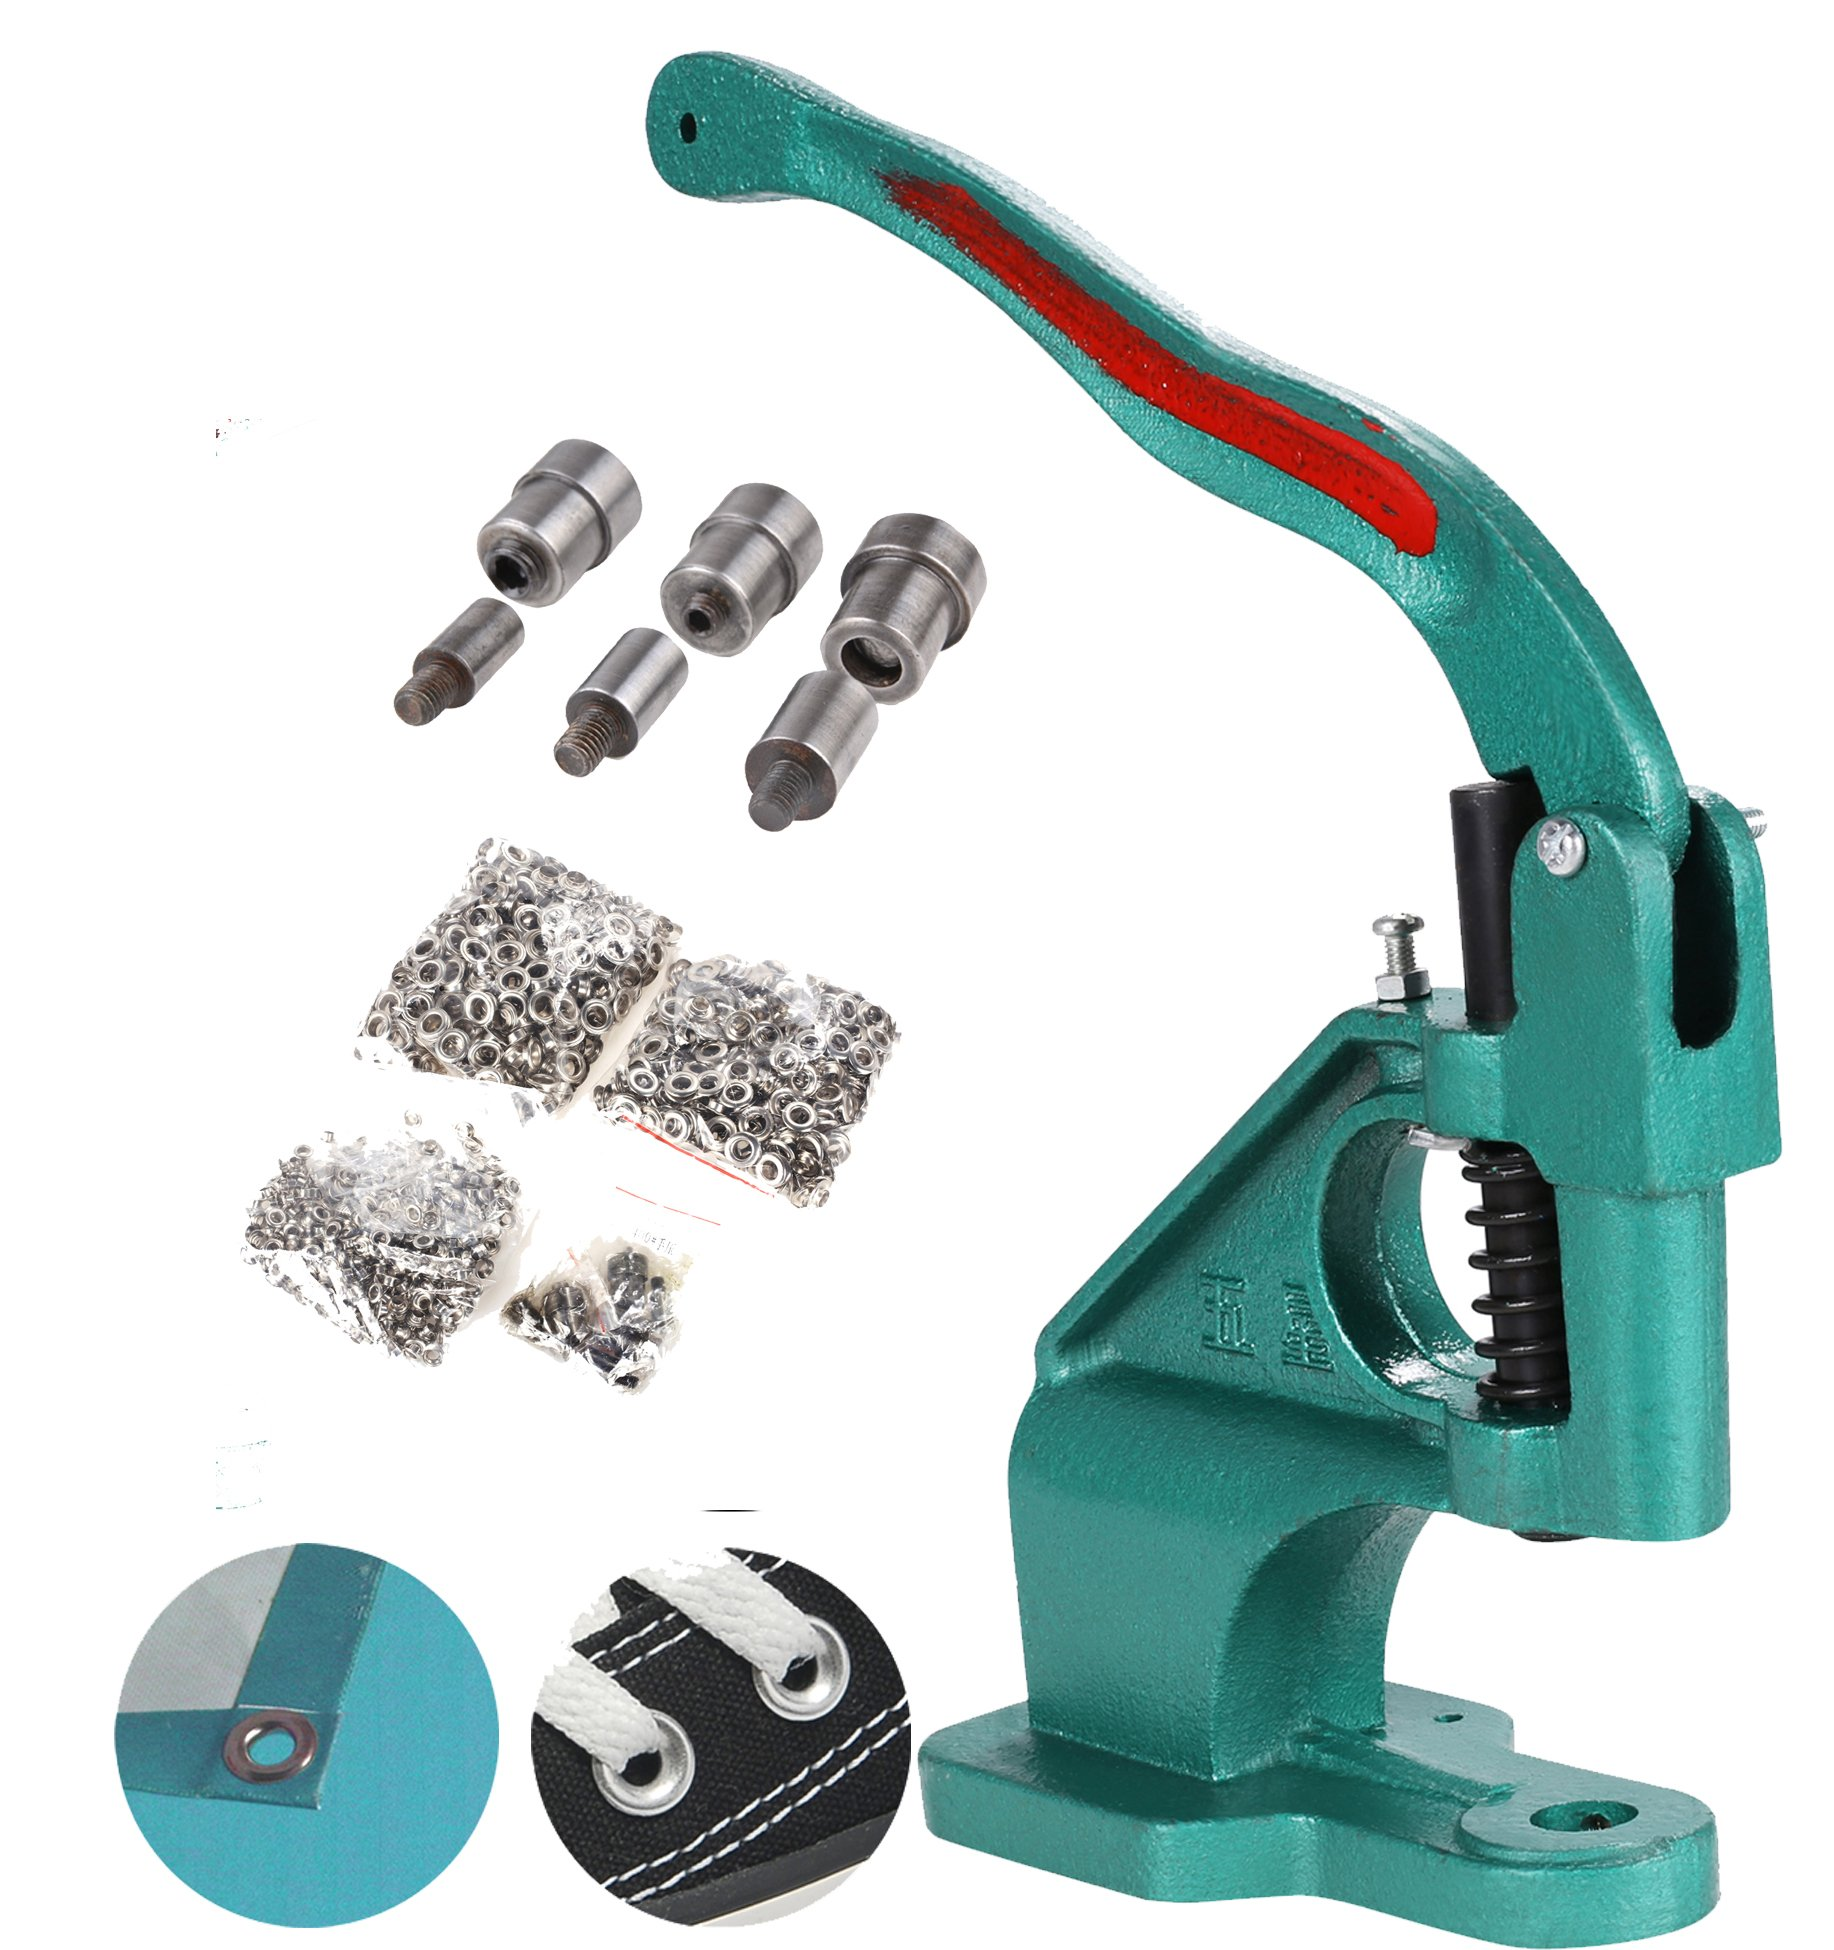 Oanon Banner Grommet Machine 3 Die and 900 Grommets Hand Press Eyelet Tool